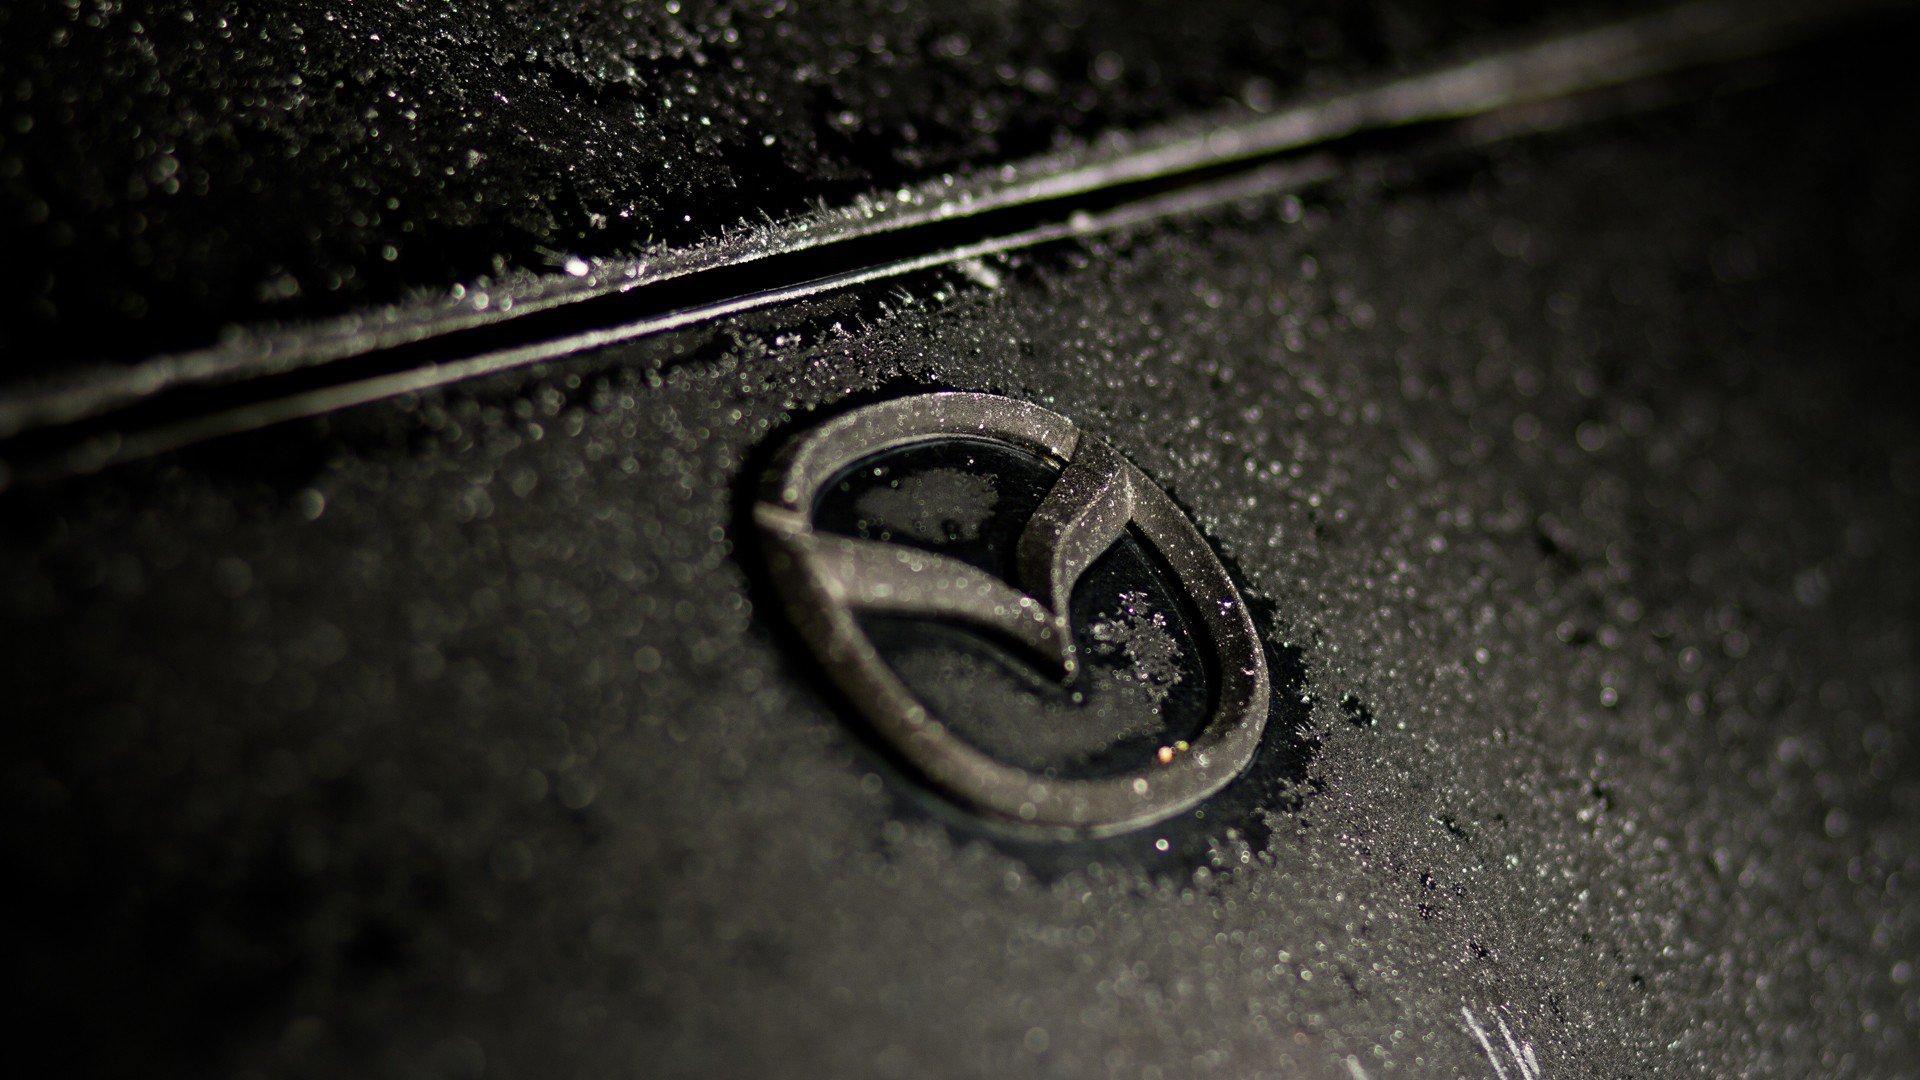 Mazda hd wallpaper background image 1920x1080 id - Car key wallpaper ...